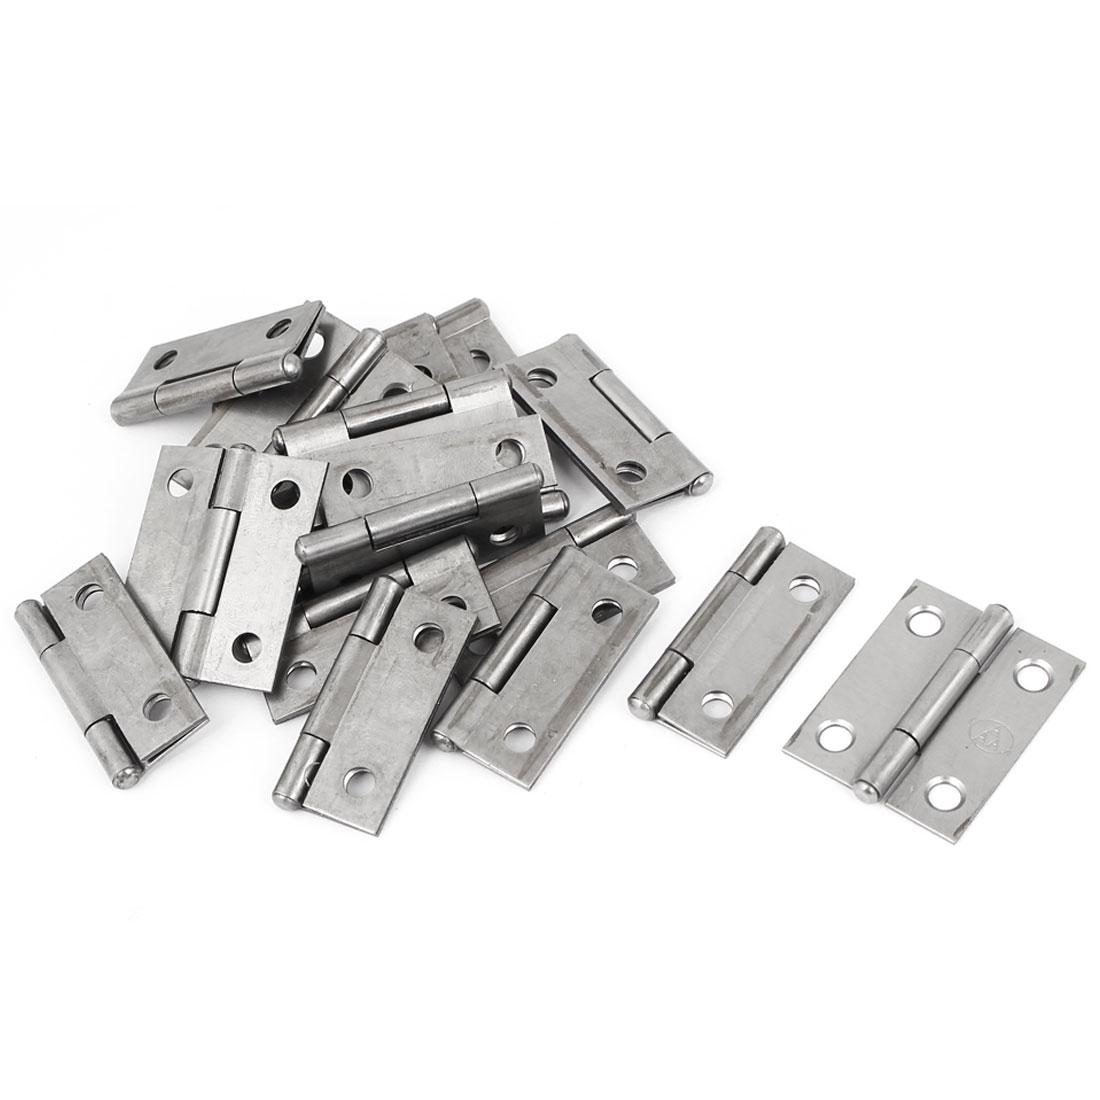 "1.5"" Long Iron Hinge 18pcs for Cabinet Drawer Door"